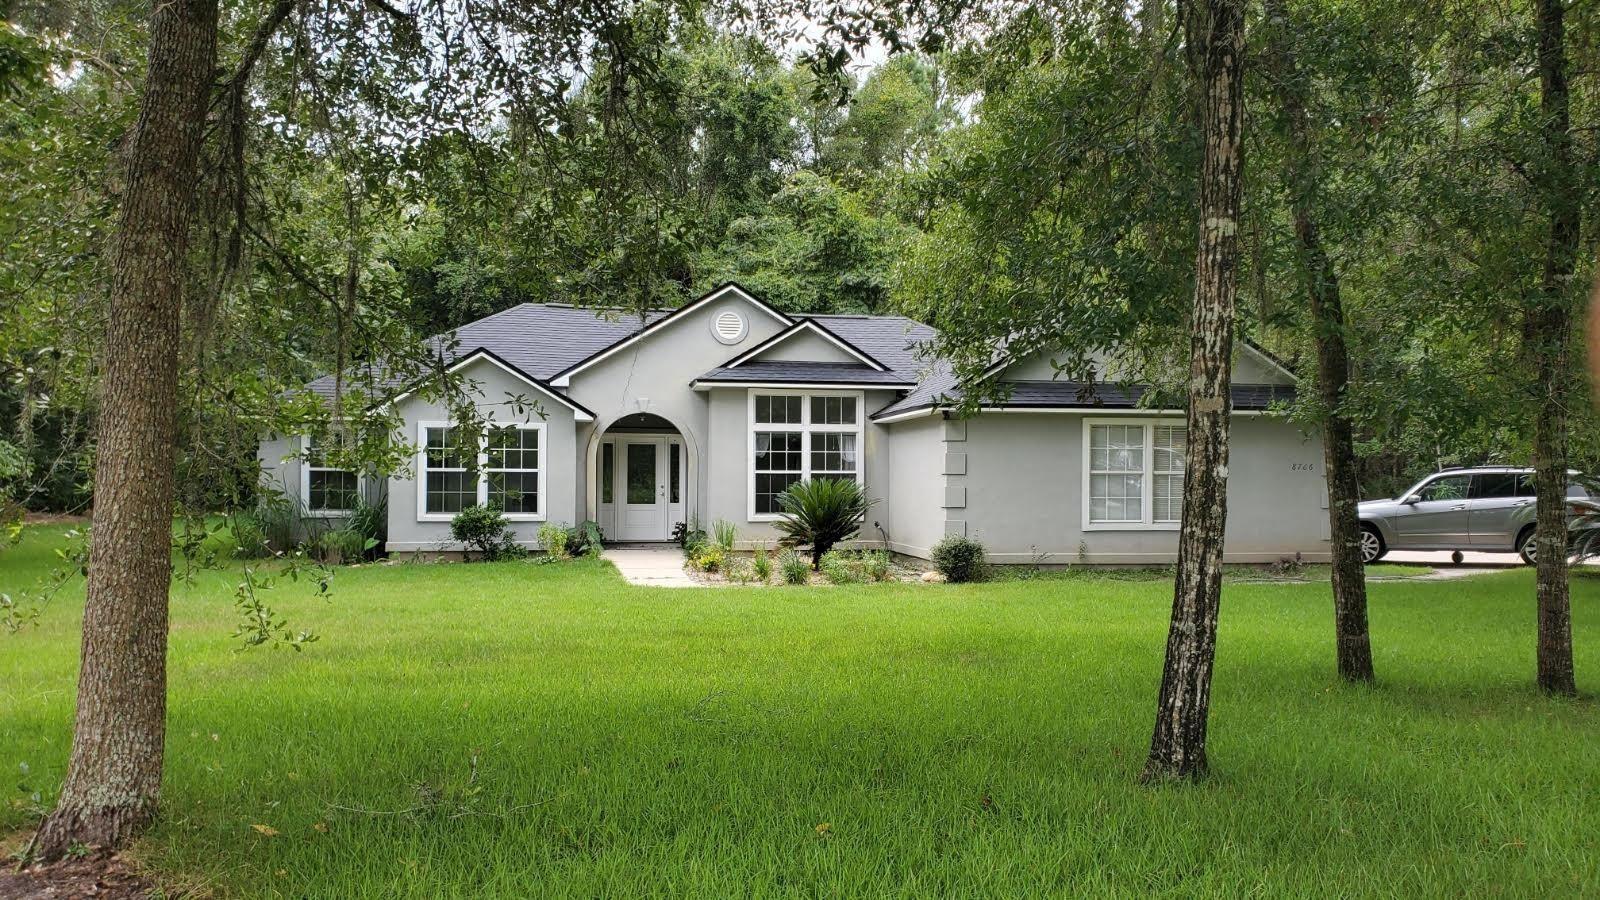 Photo of 8766 Celia Road, TALLAHASSEE, FL 32305 (MLS # 336115)